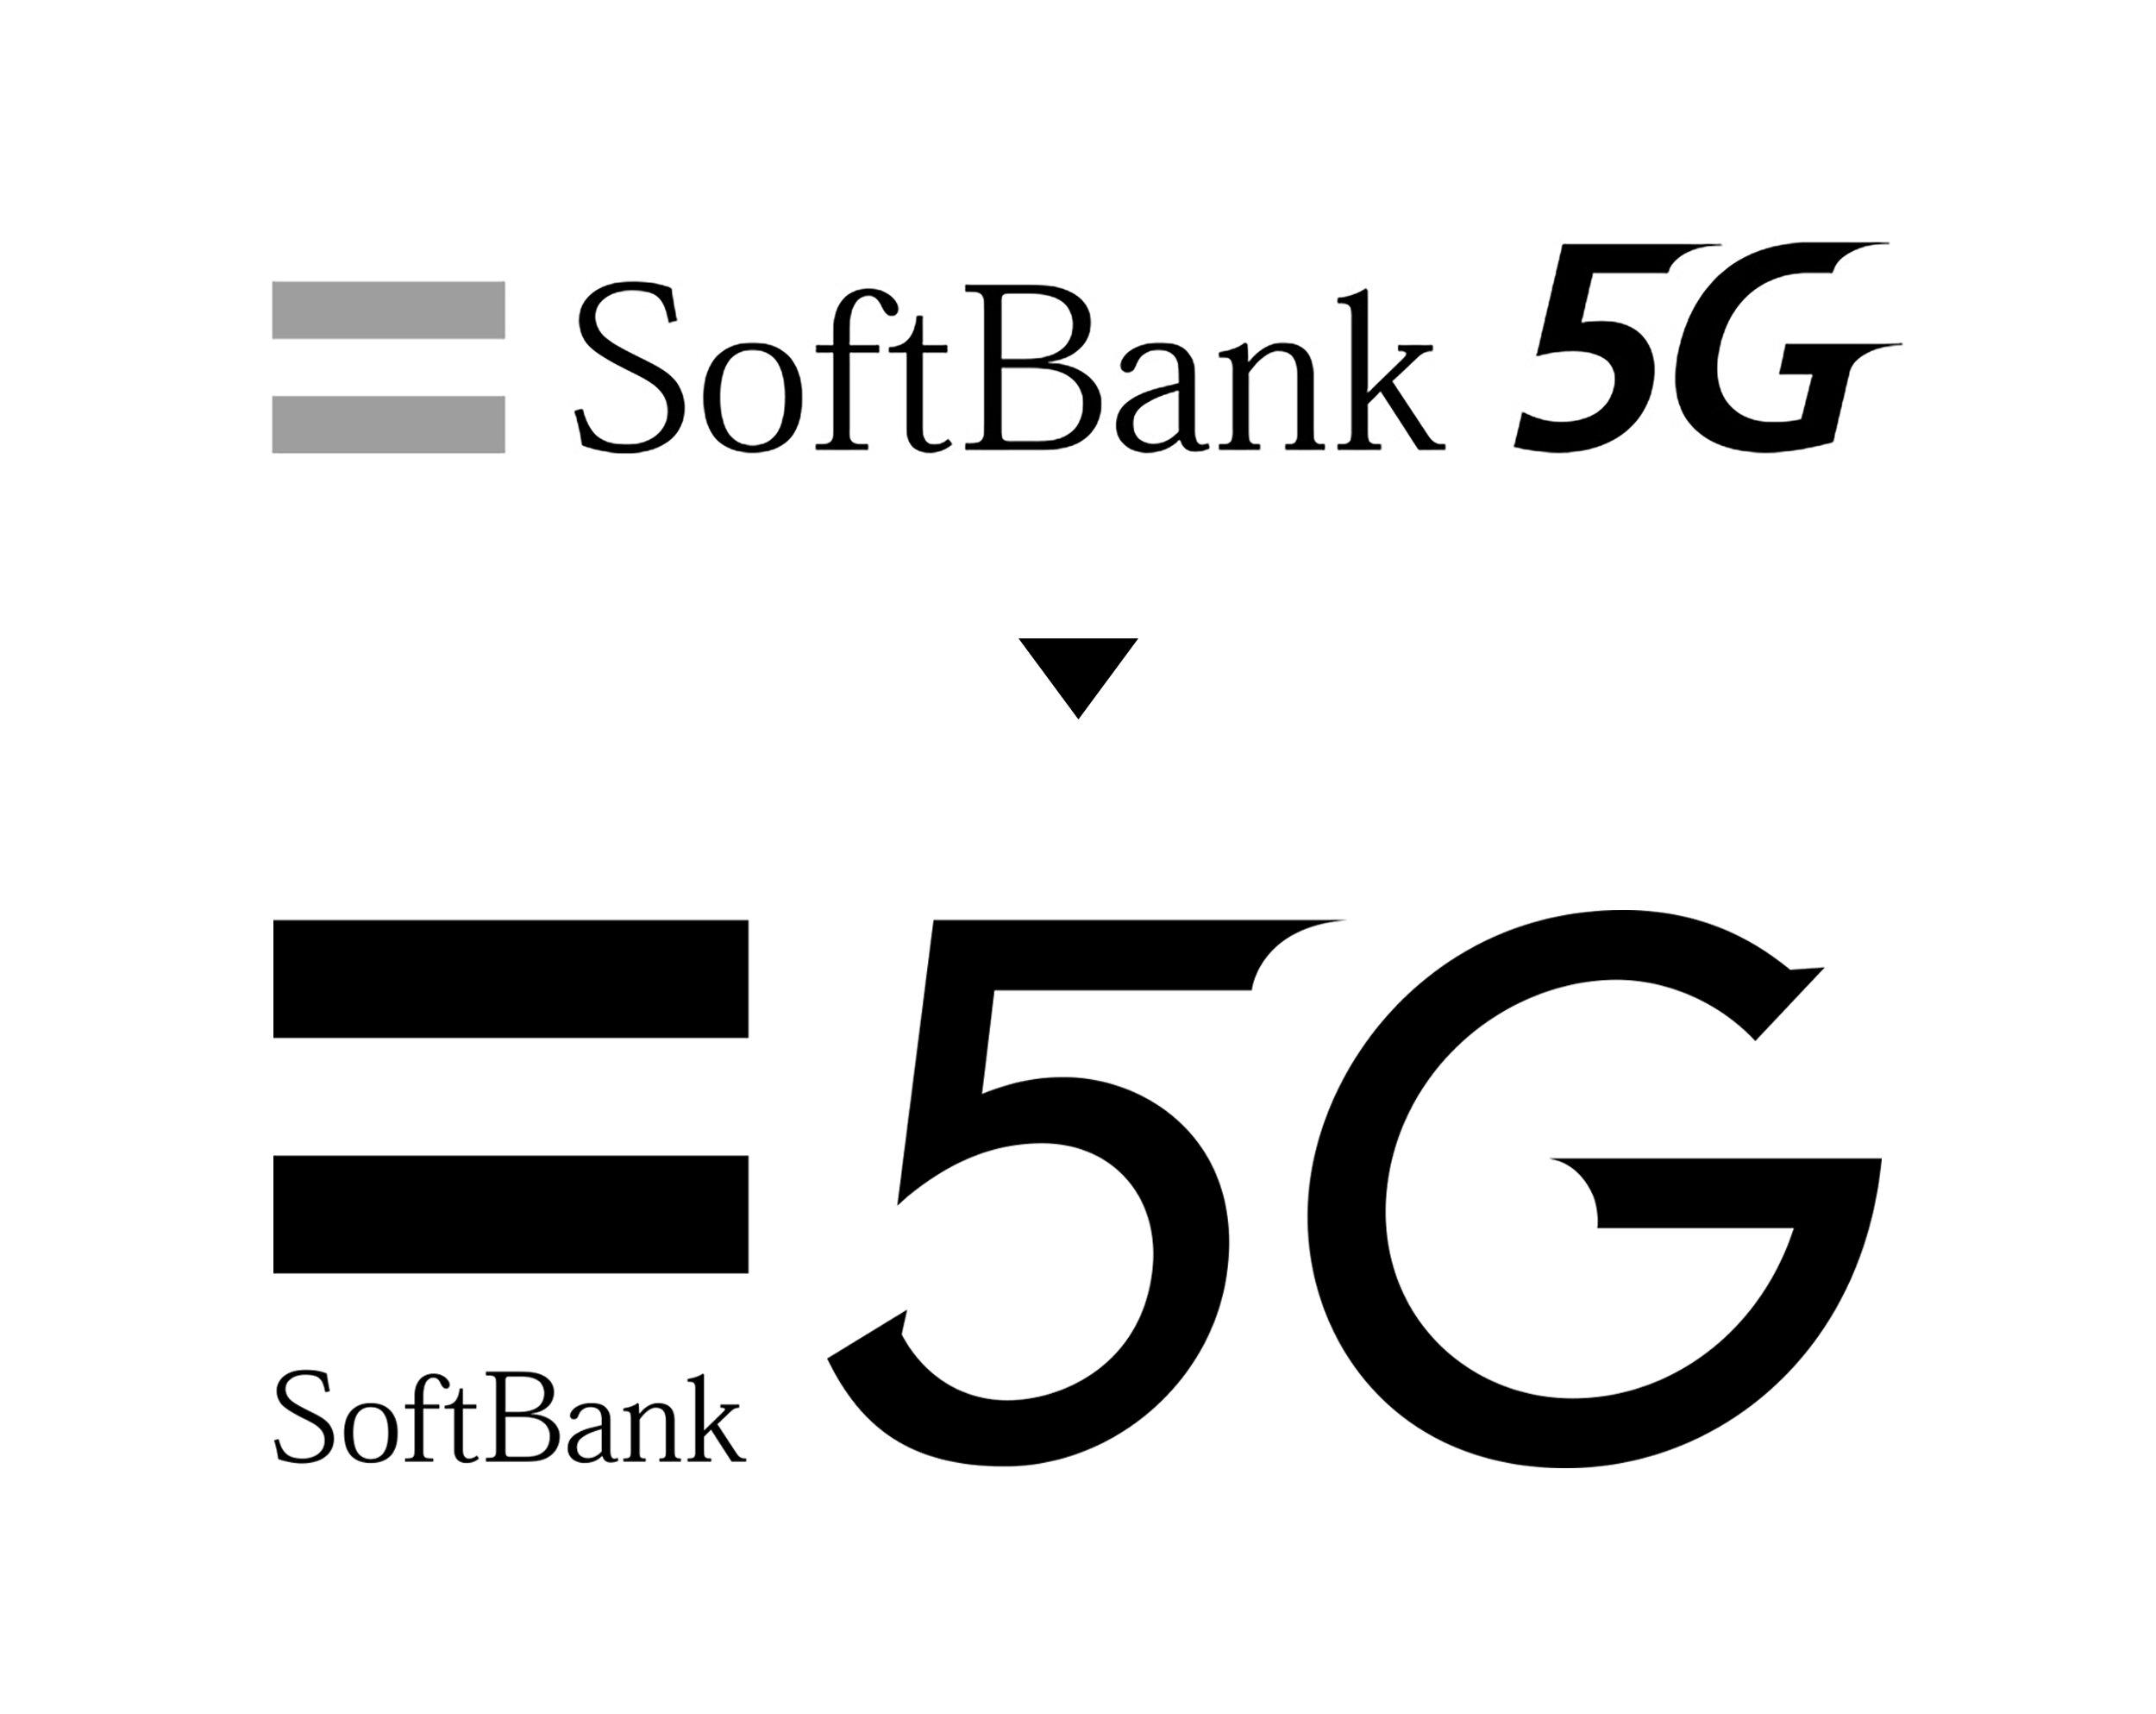 softbank_ロゴ改定.jpg